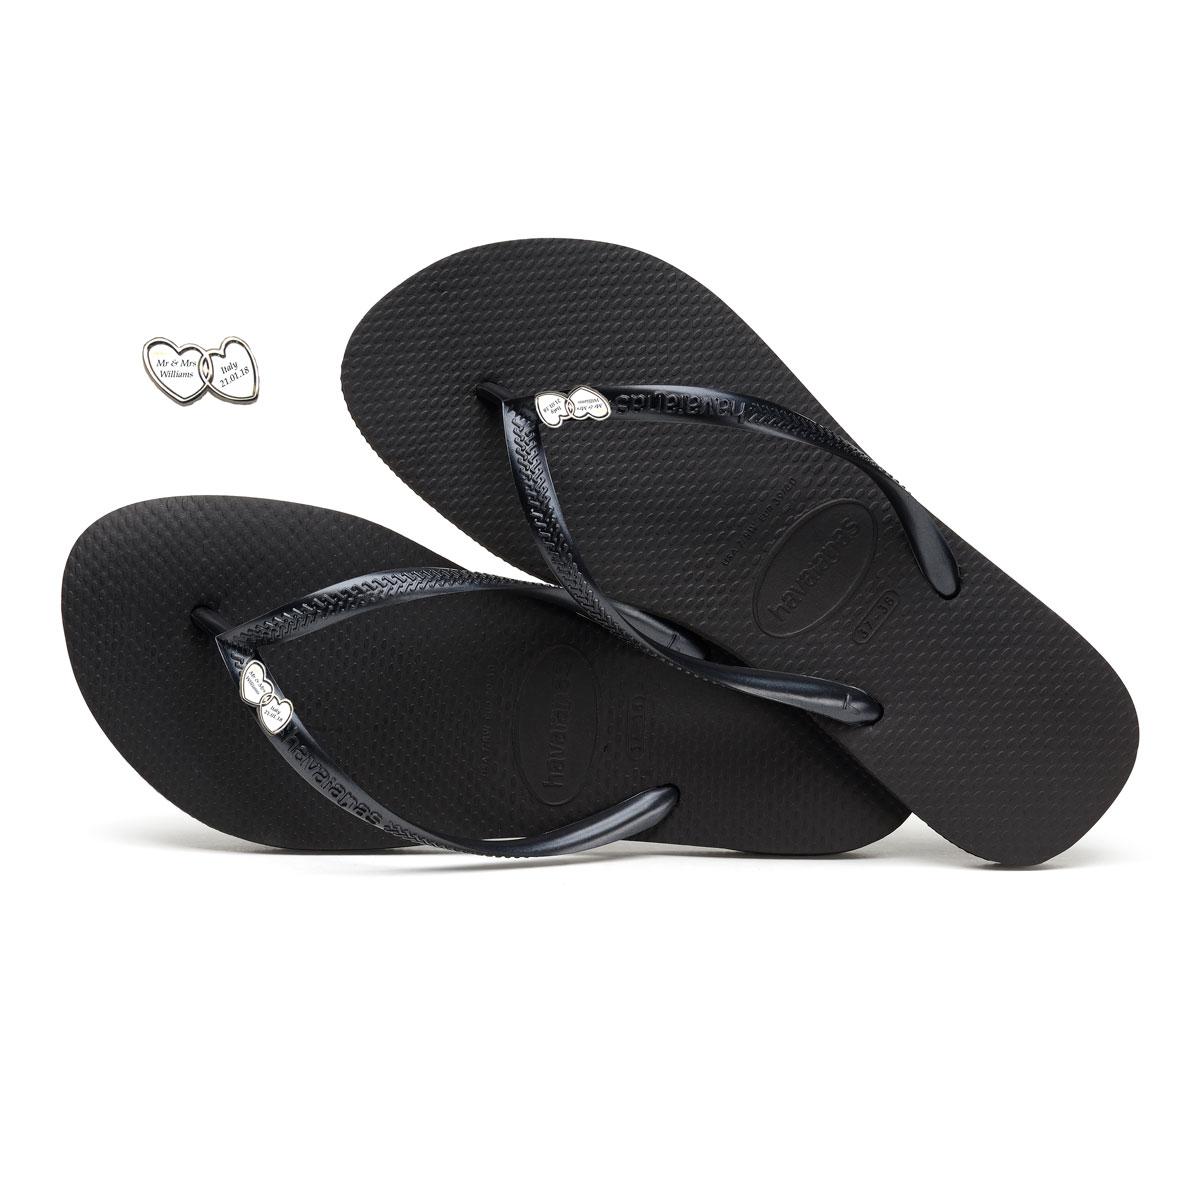 Havaianas Slim Black Flip-Flops with Double Heart Silver Charm Wedding